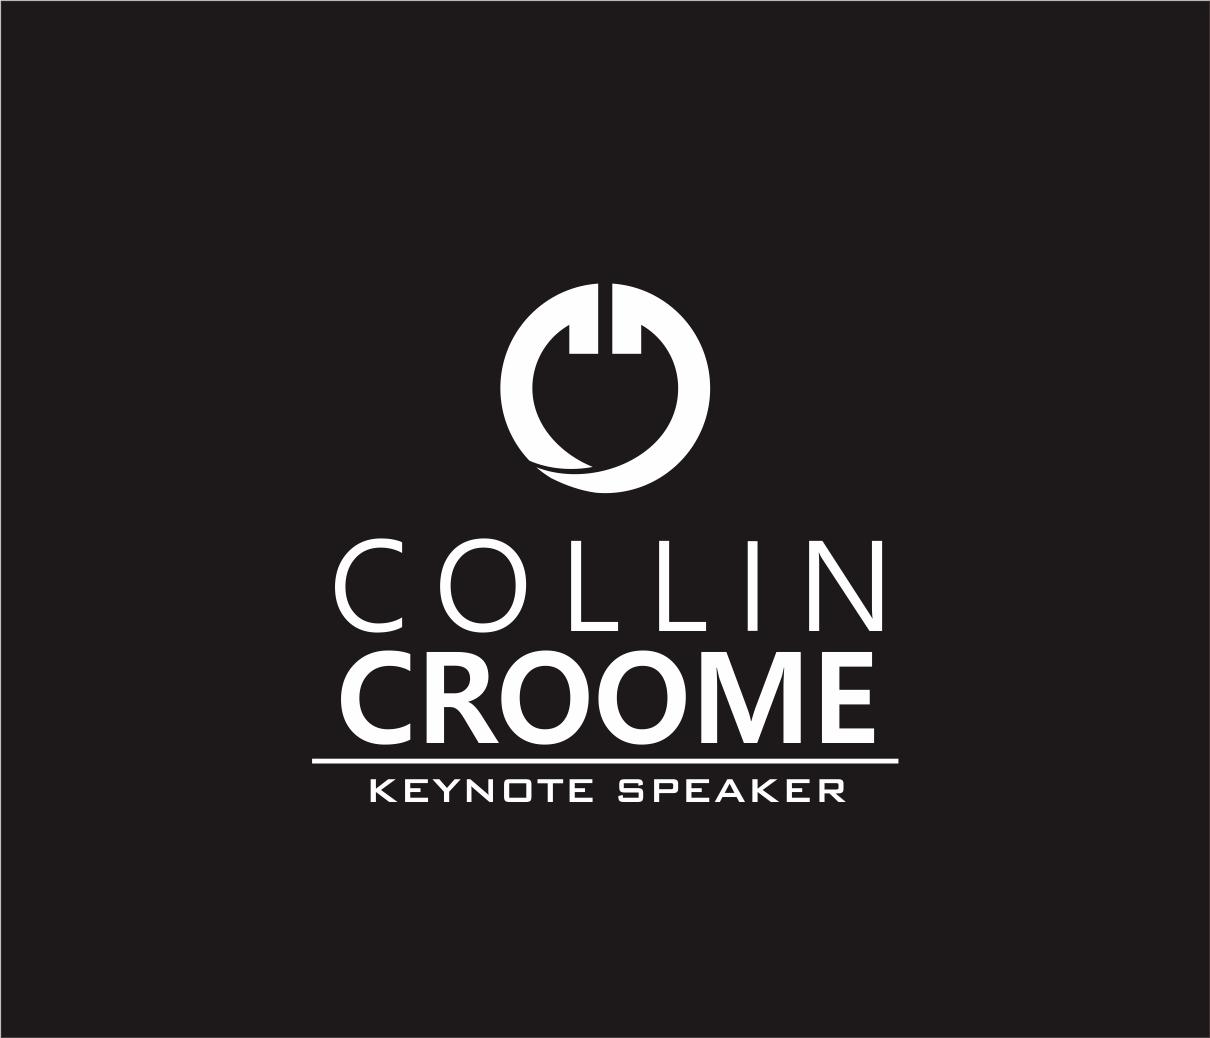 Logo Design by Armada Jamaluddin - Entry No. 264 in the Logo Design Contest Modern Logo Design for Collin Croome.